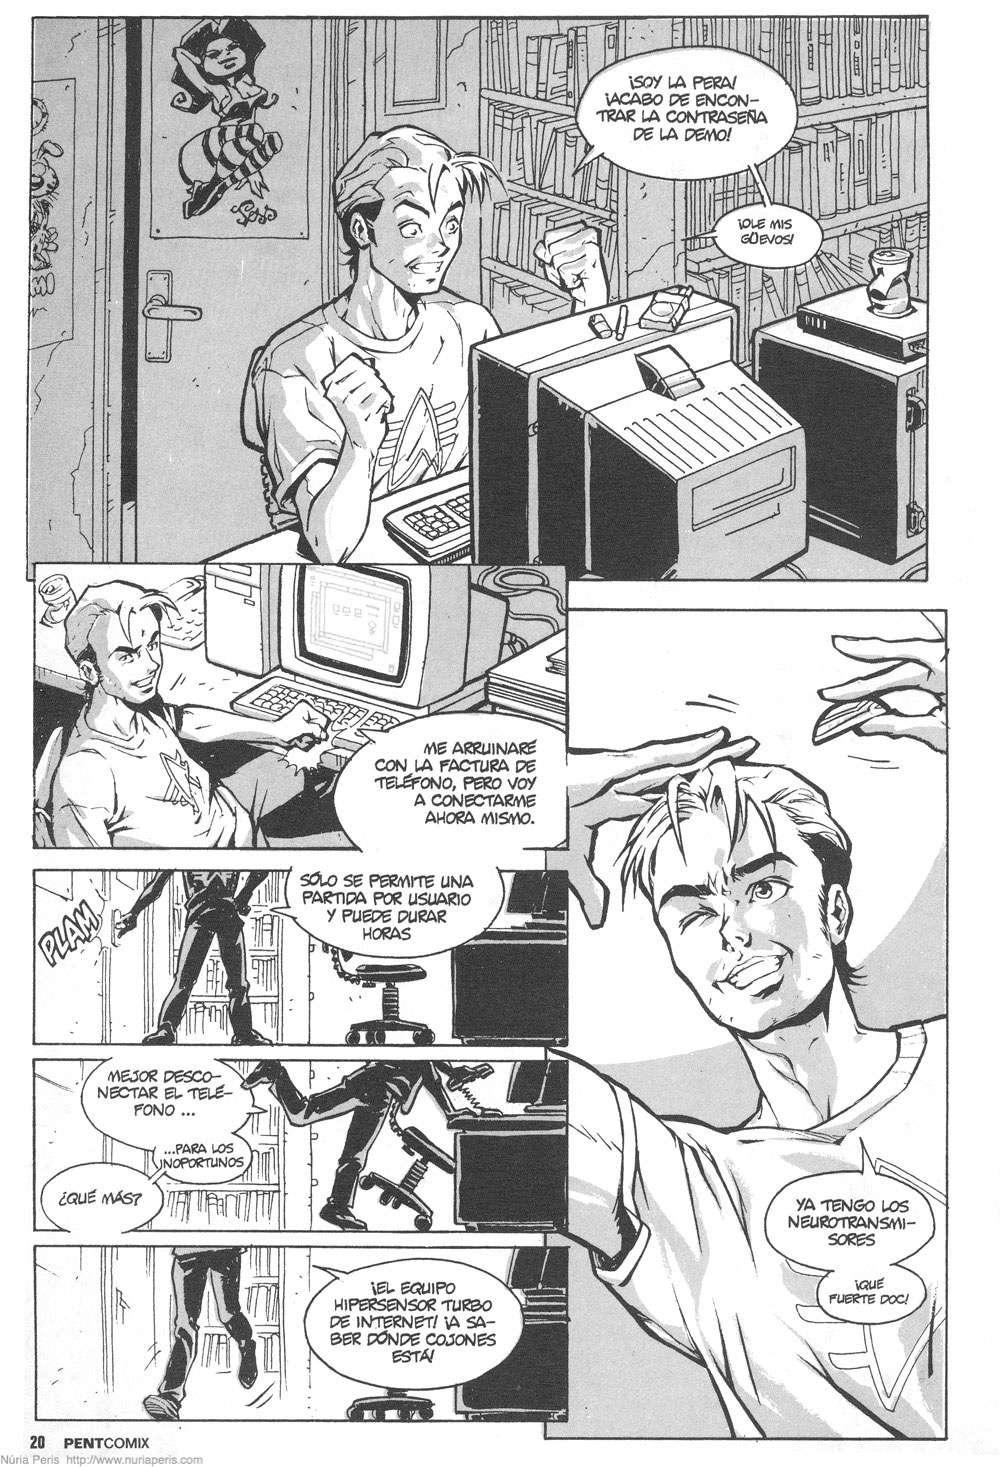 Penthouse_comics_01.jpg